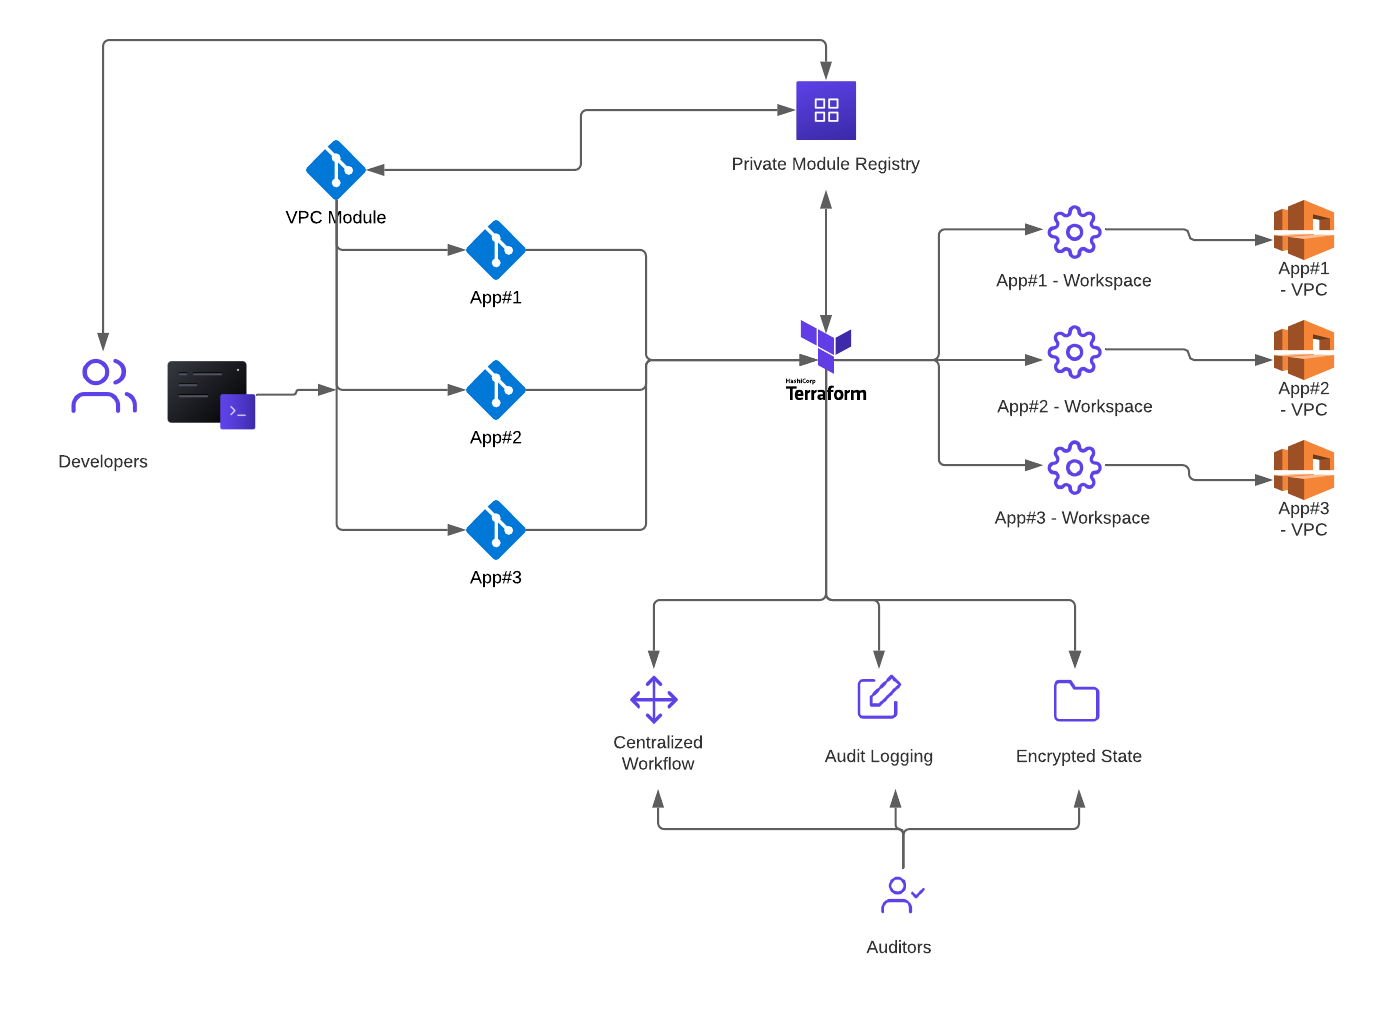 Terraform workflow going through the Private Module Registry